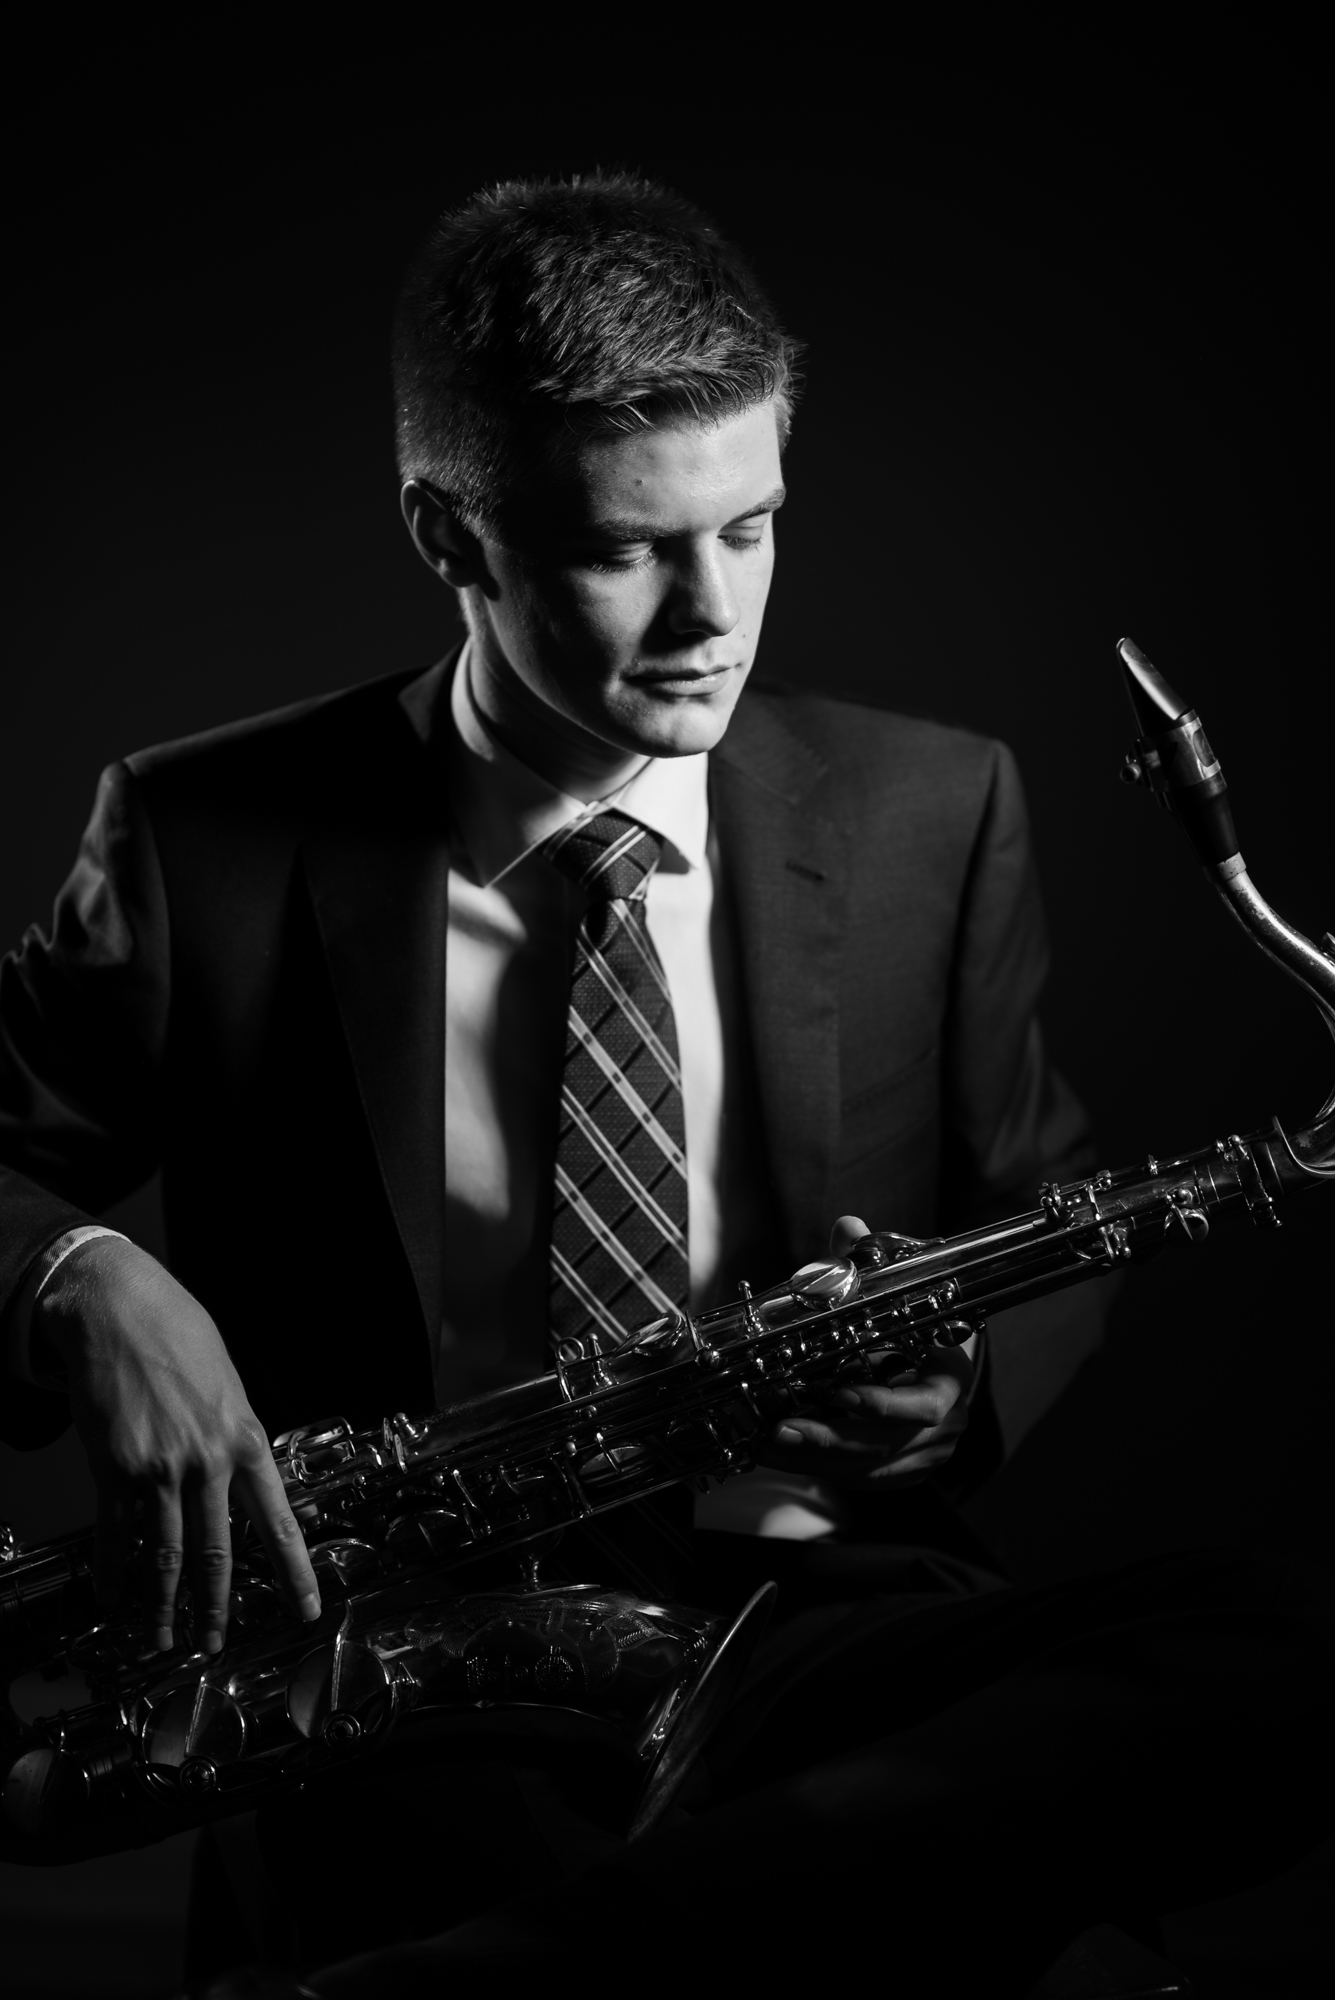 High School Senior Saxophone